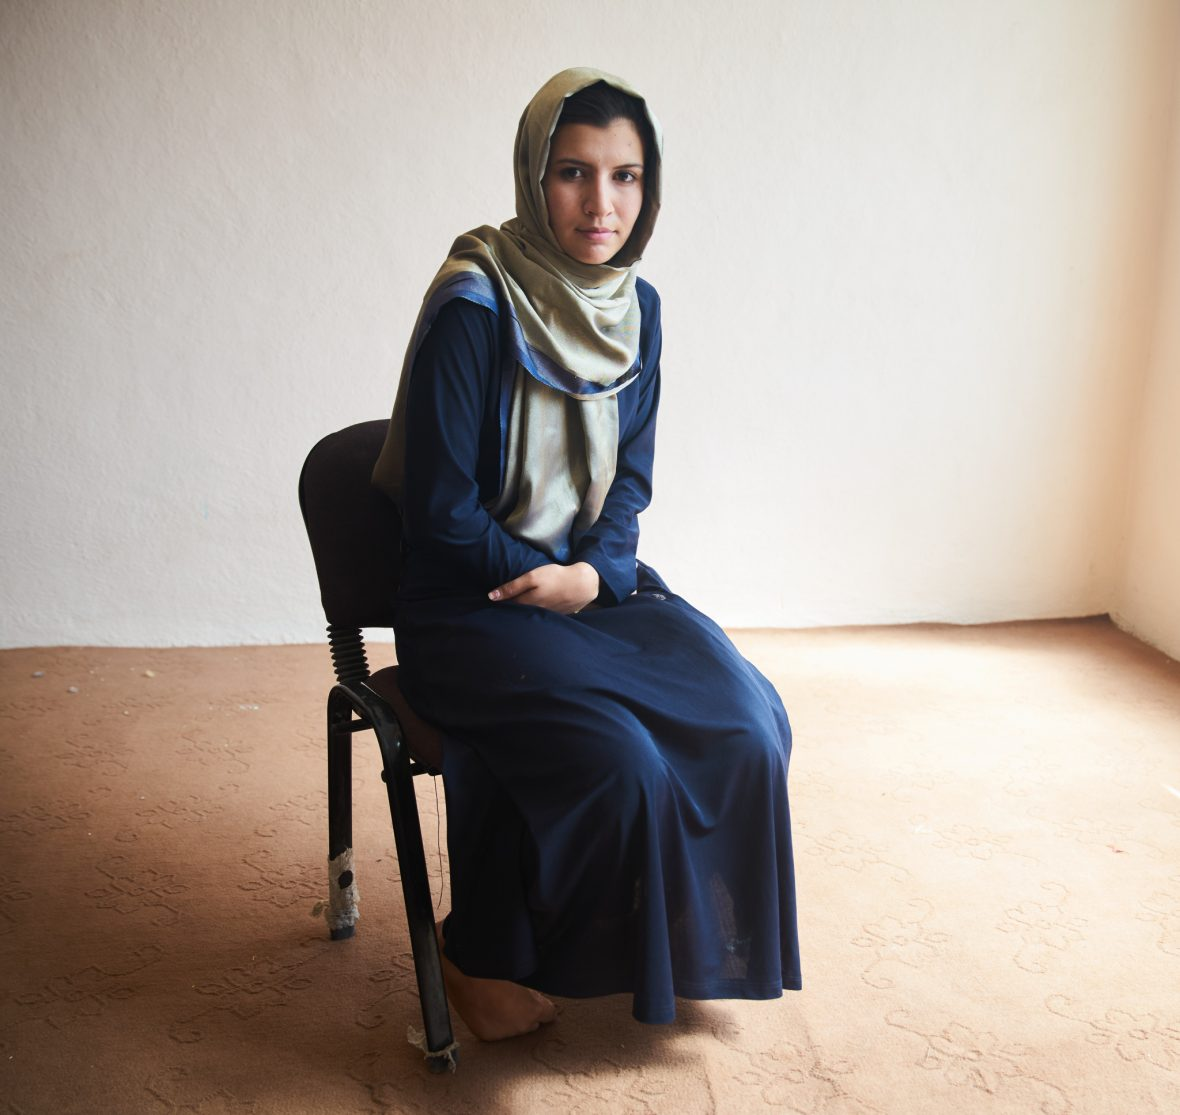 A local Afghan woman.